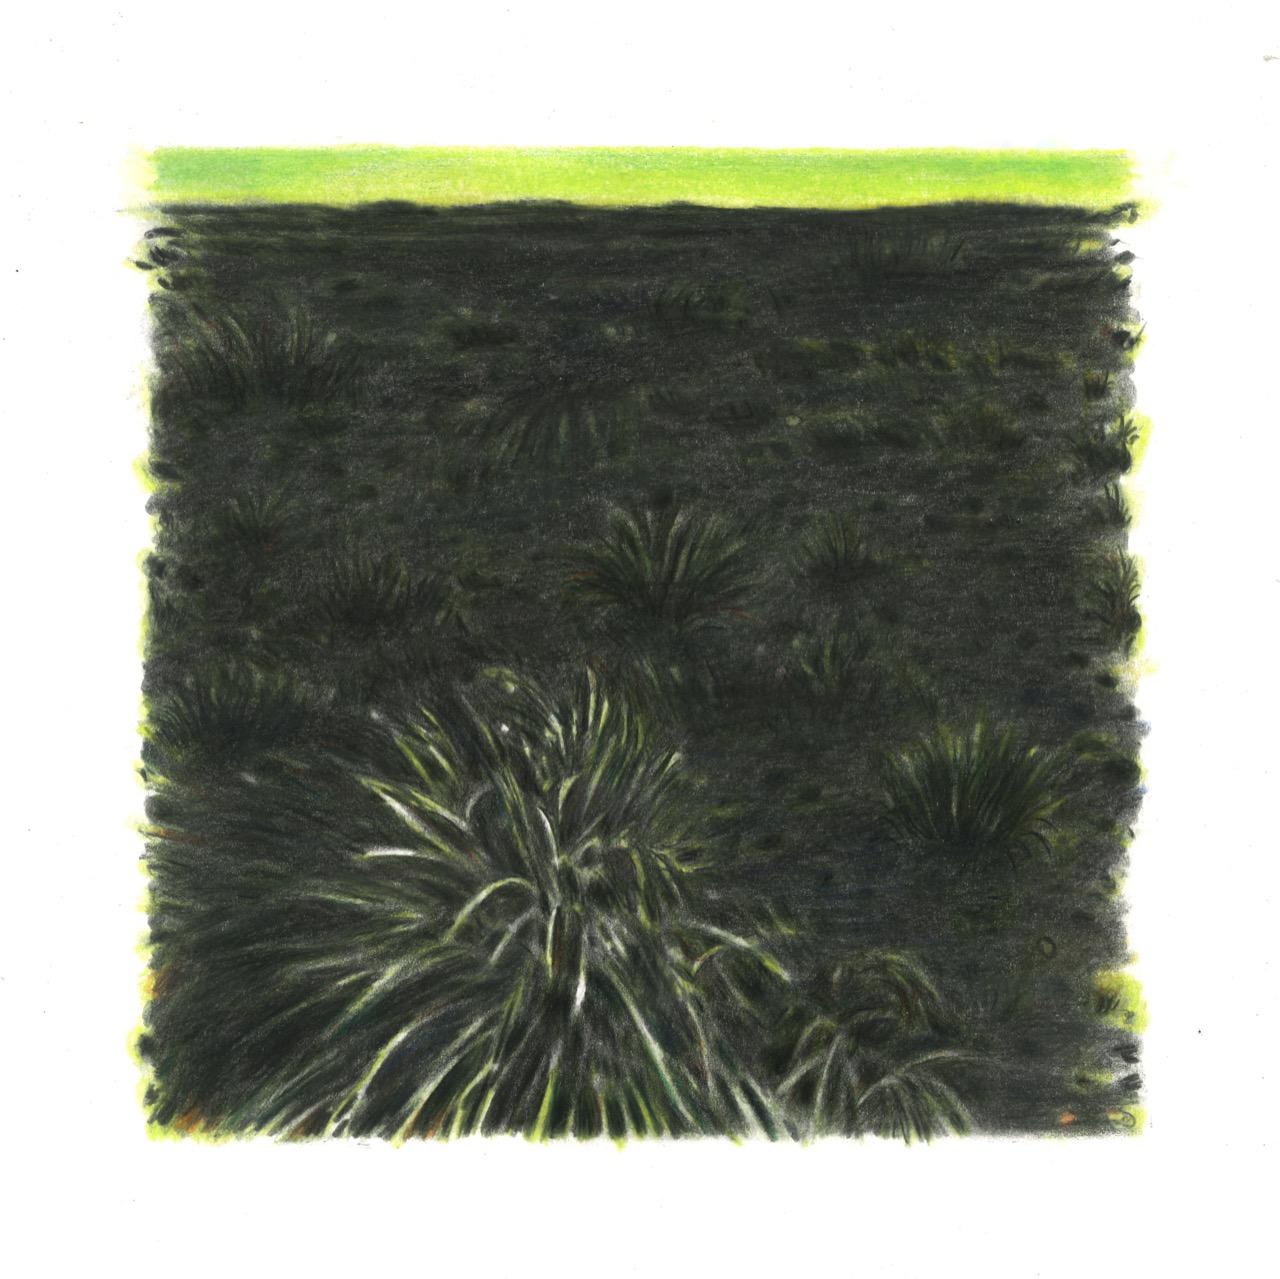 Green Hope, 2021, χρωματιστά μολύβια σε χαρτί, 23Χ23 εκ.